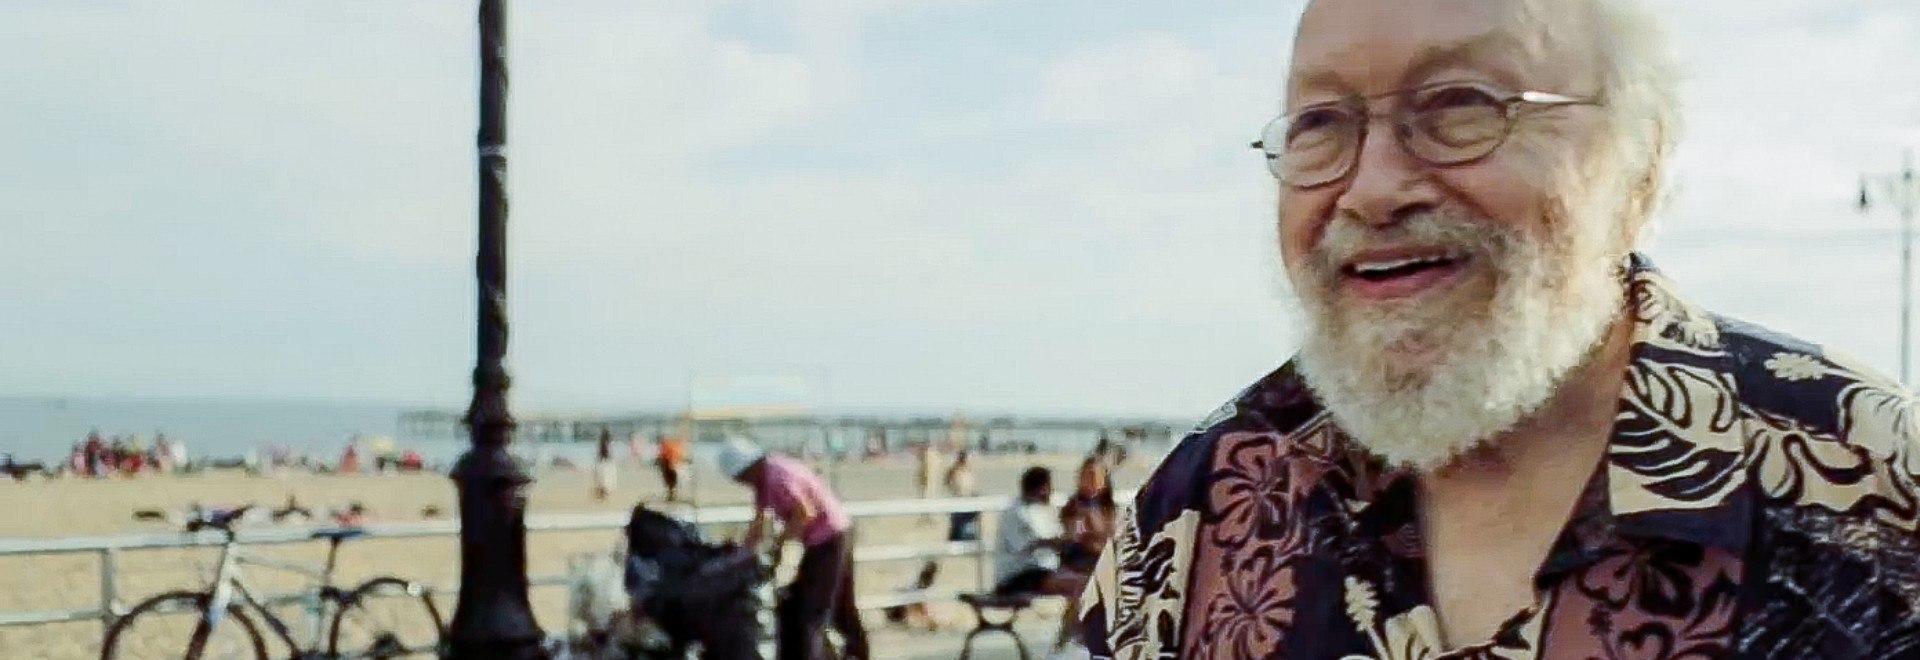 Harold Feinstein - New York e l'attimo